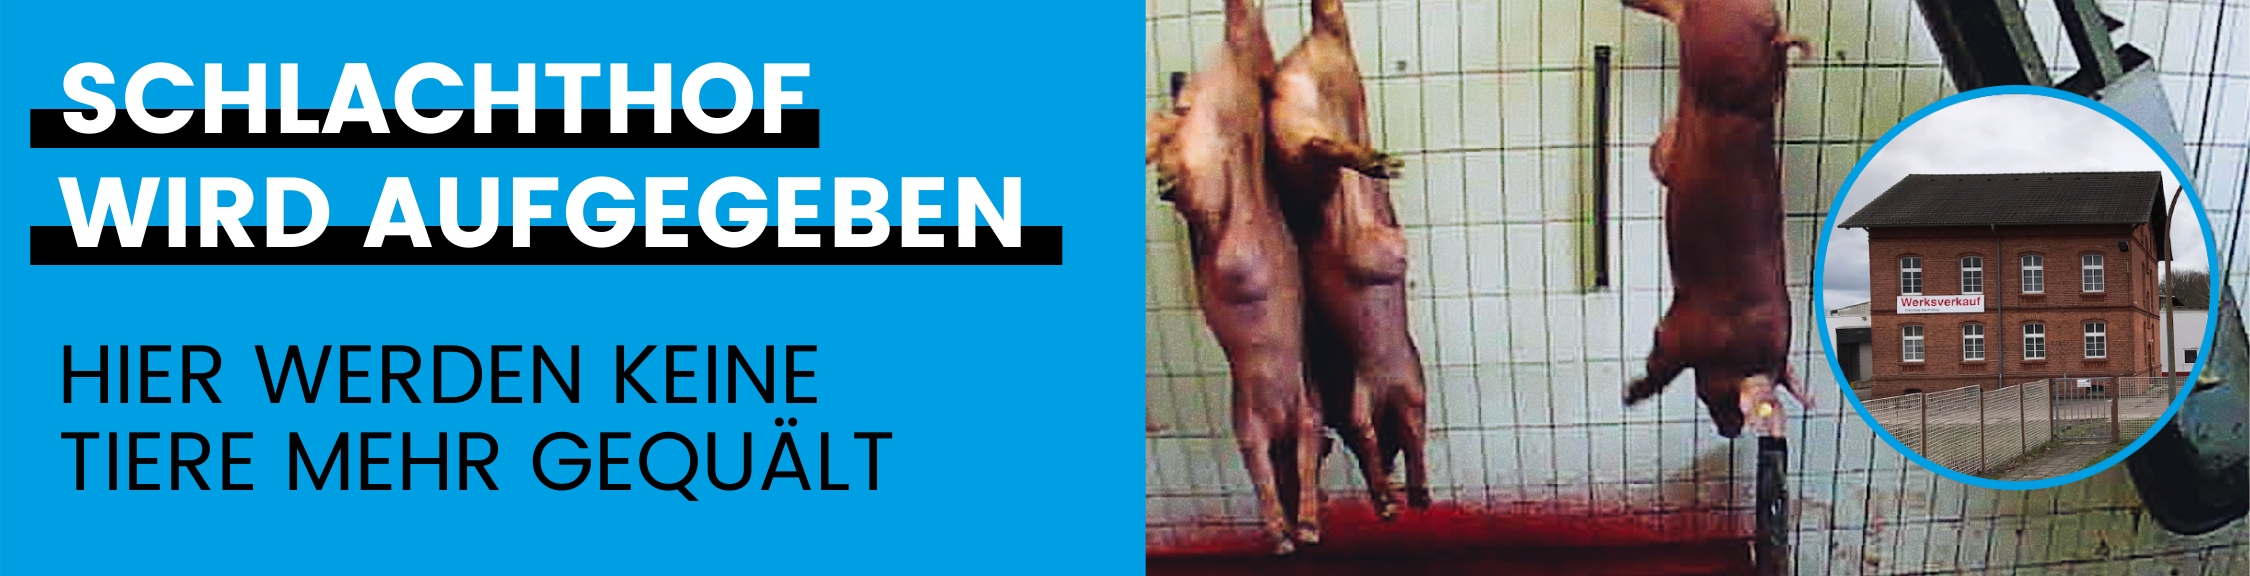 © Bild: Deutsches Tierschutzbüro e.V. – Schachthof Neuruppin